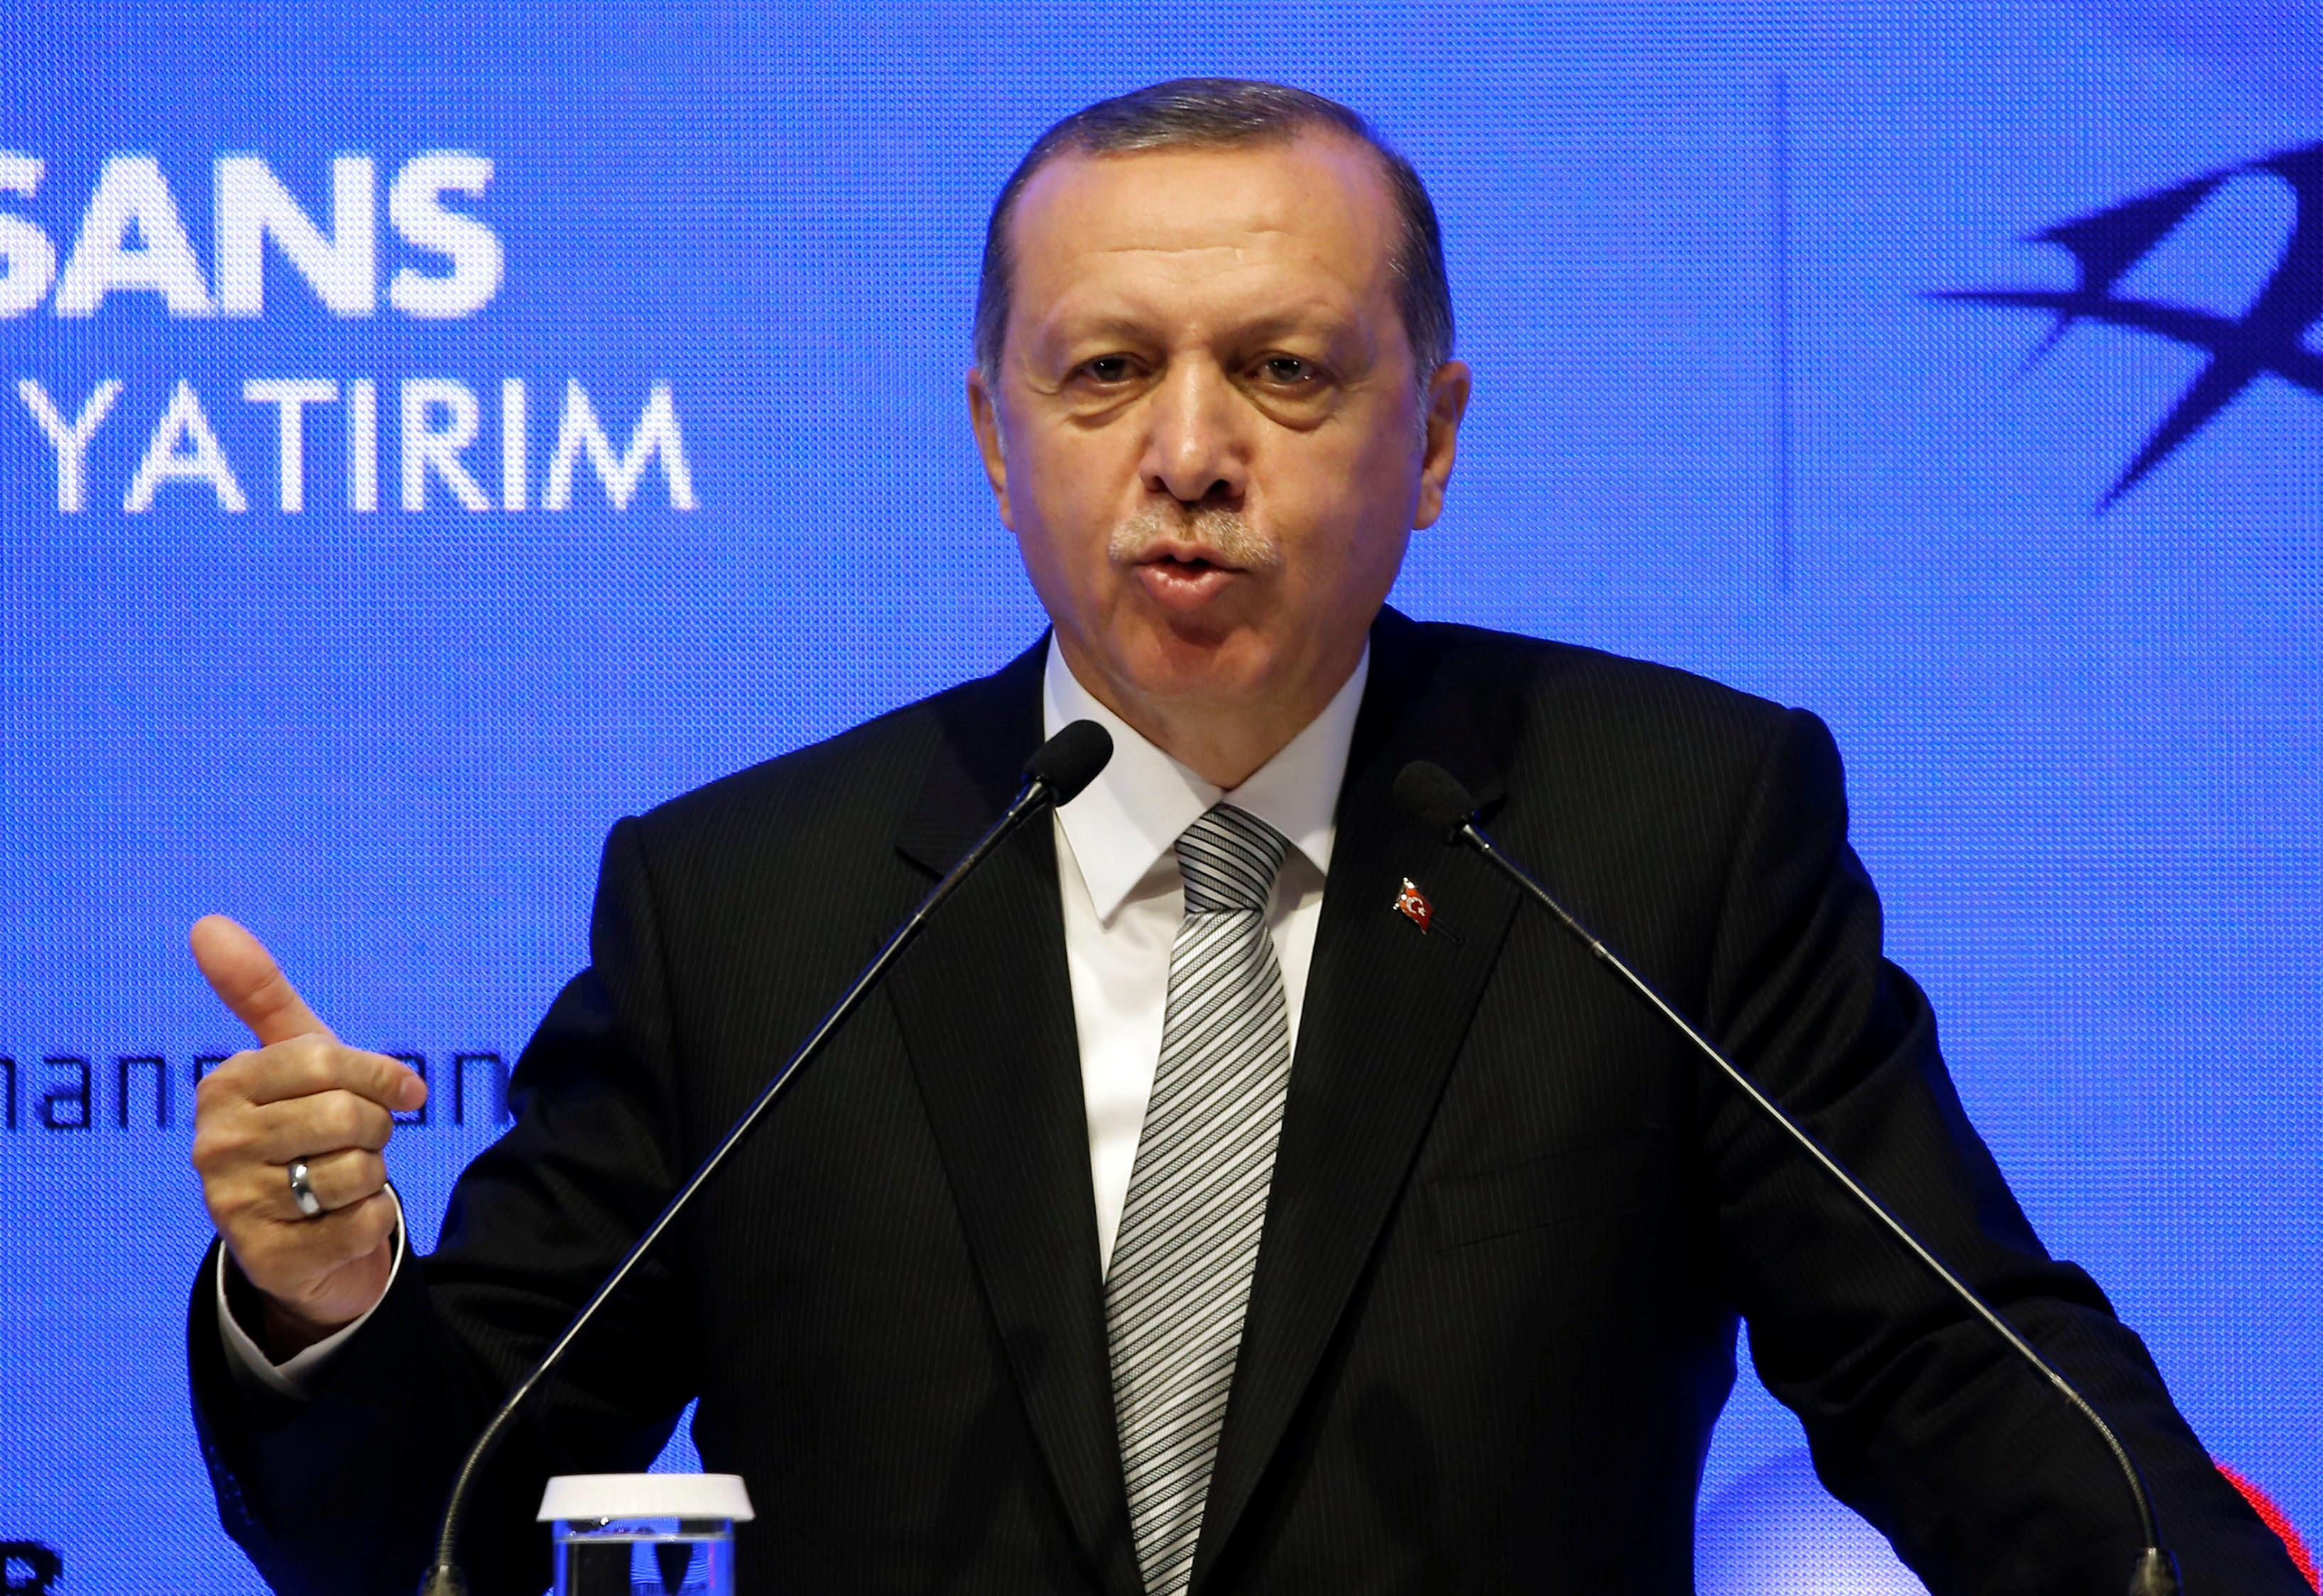 <p>Президент Турции Реджеп Тайип Эрдоган. Фото: &copy; REUTERS/Murad Sezer</p>